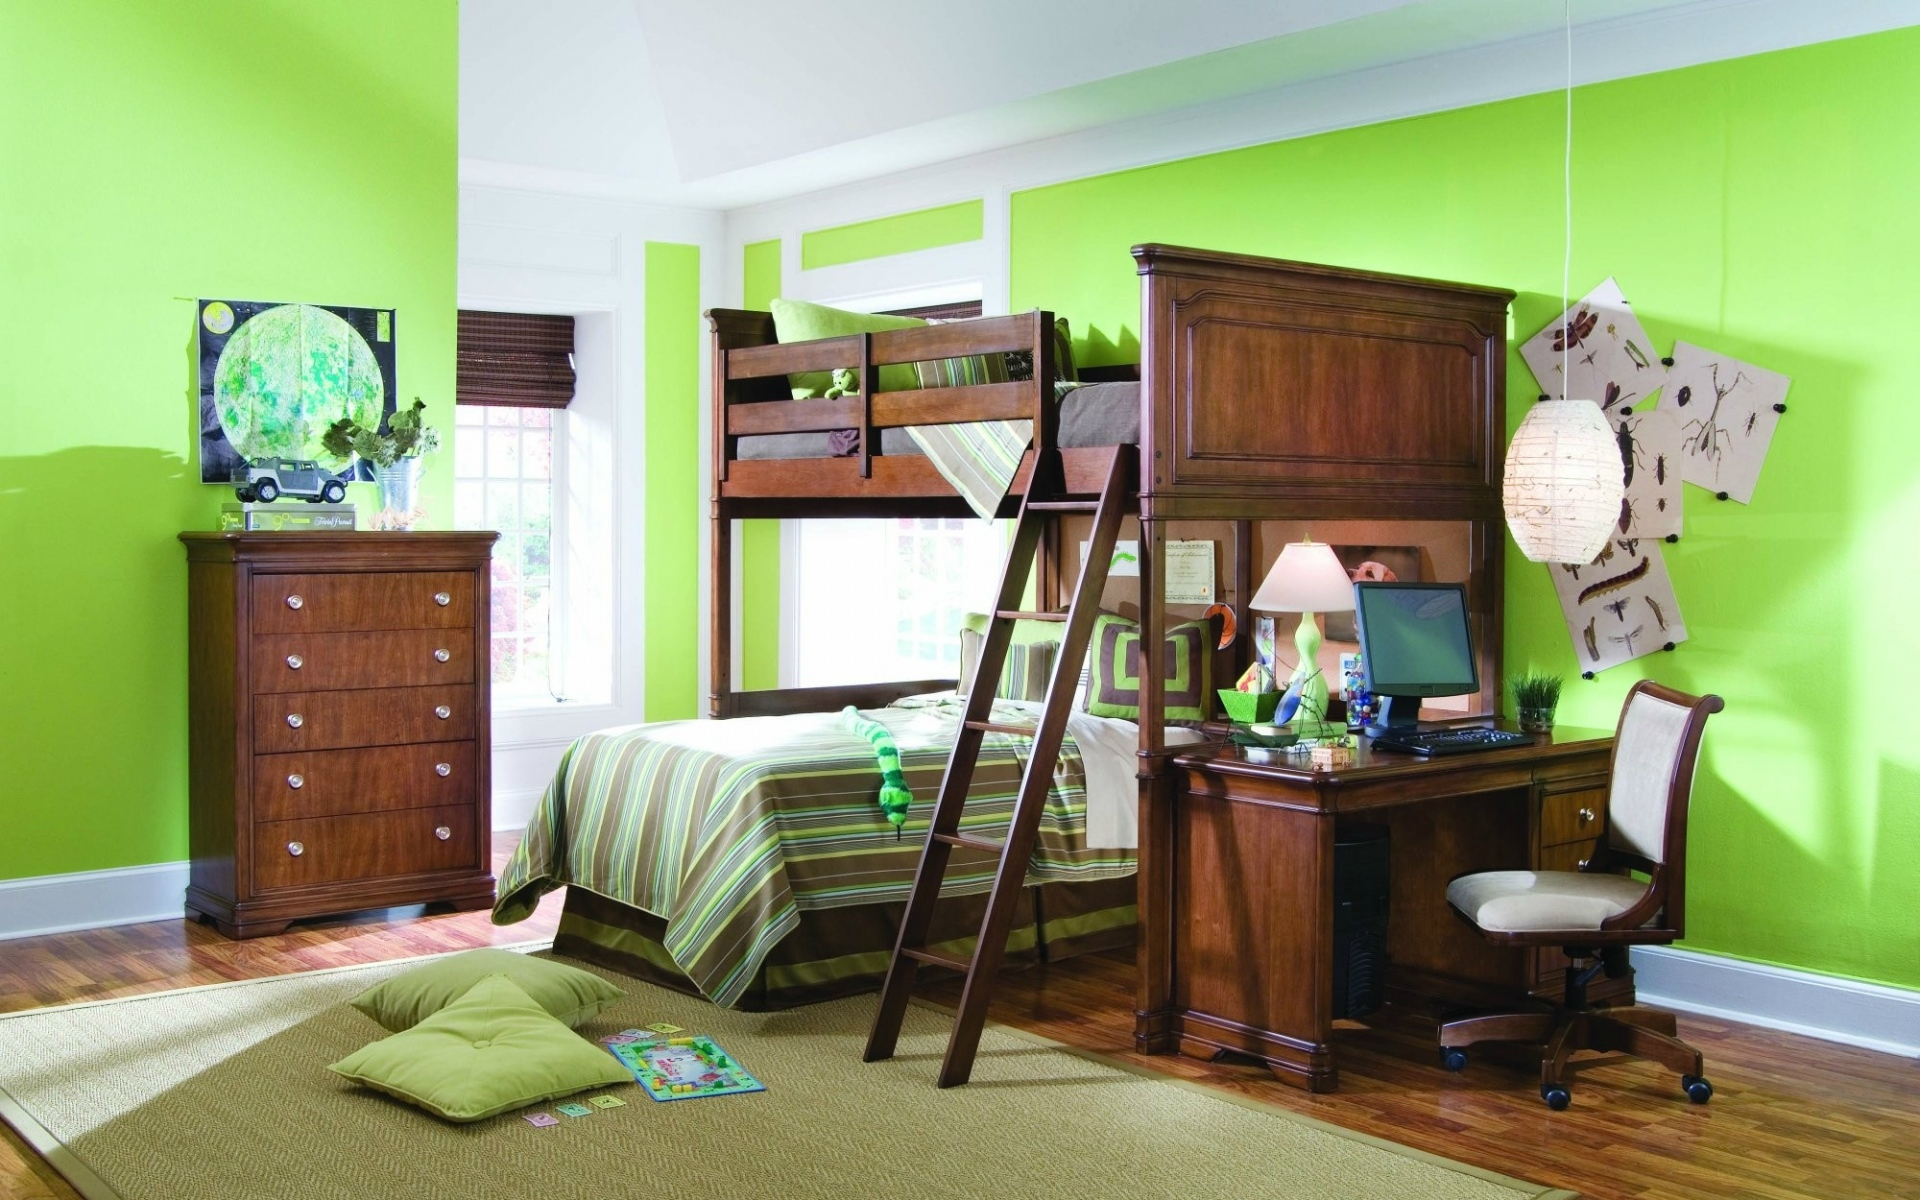 Картинки интерьер, комната, квартира,кухня, кровать, стол, стул, компьютер, лампа, подушки, зеркало, ковры, зеленый фото и обои на рабочий стол